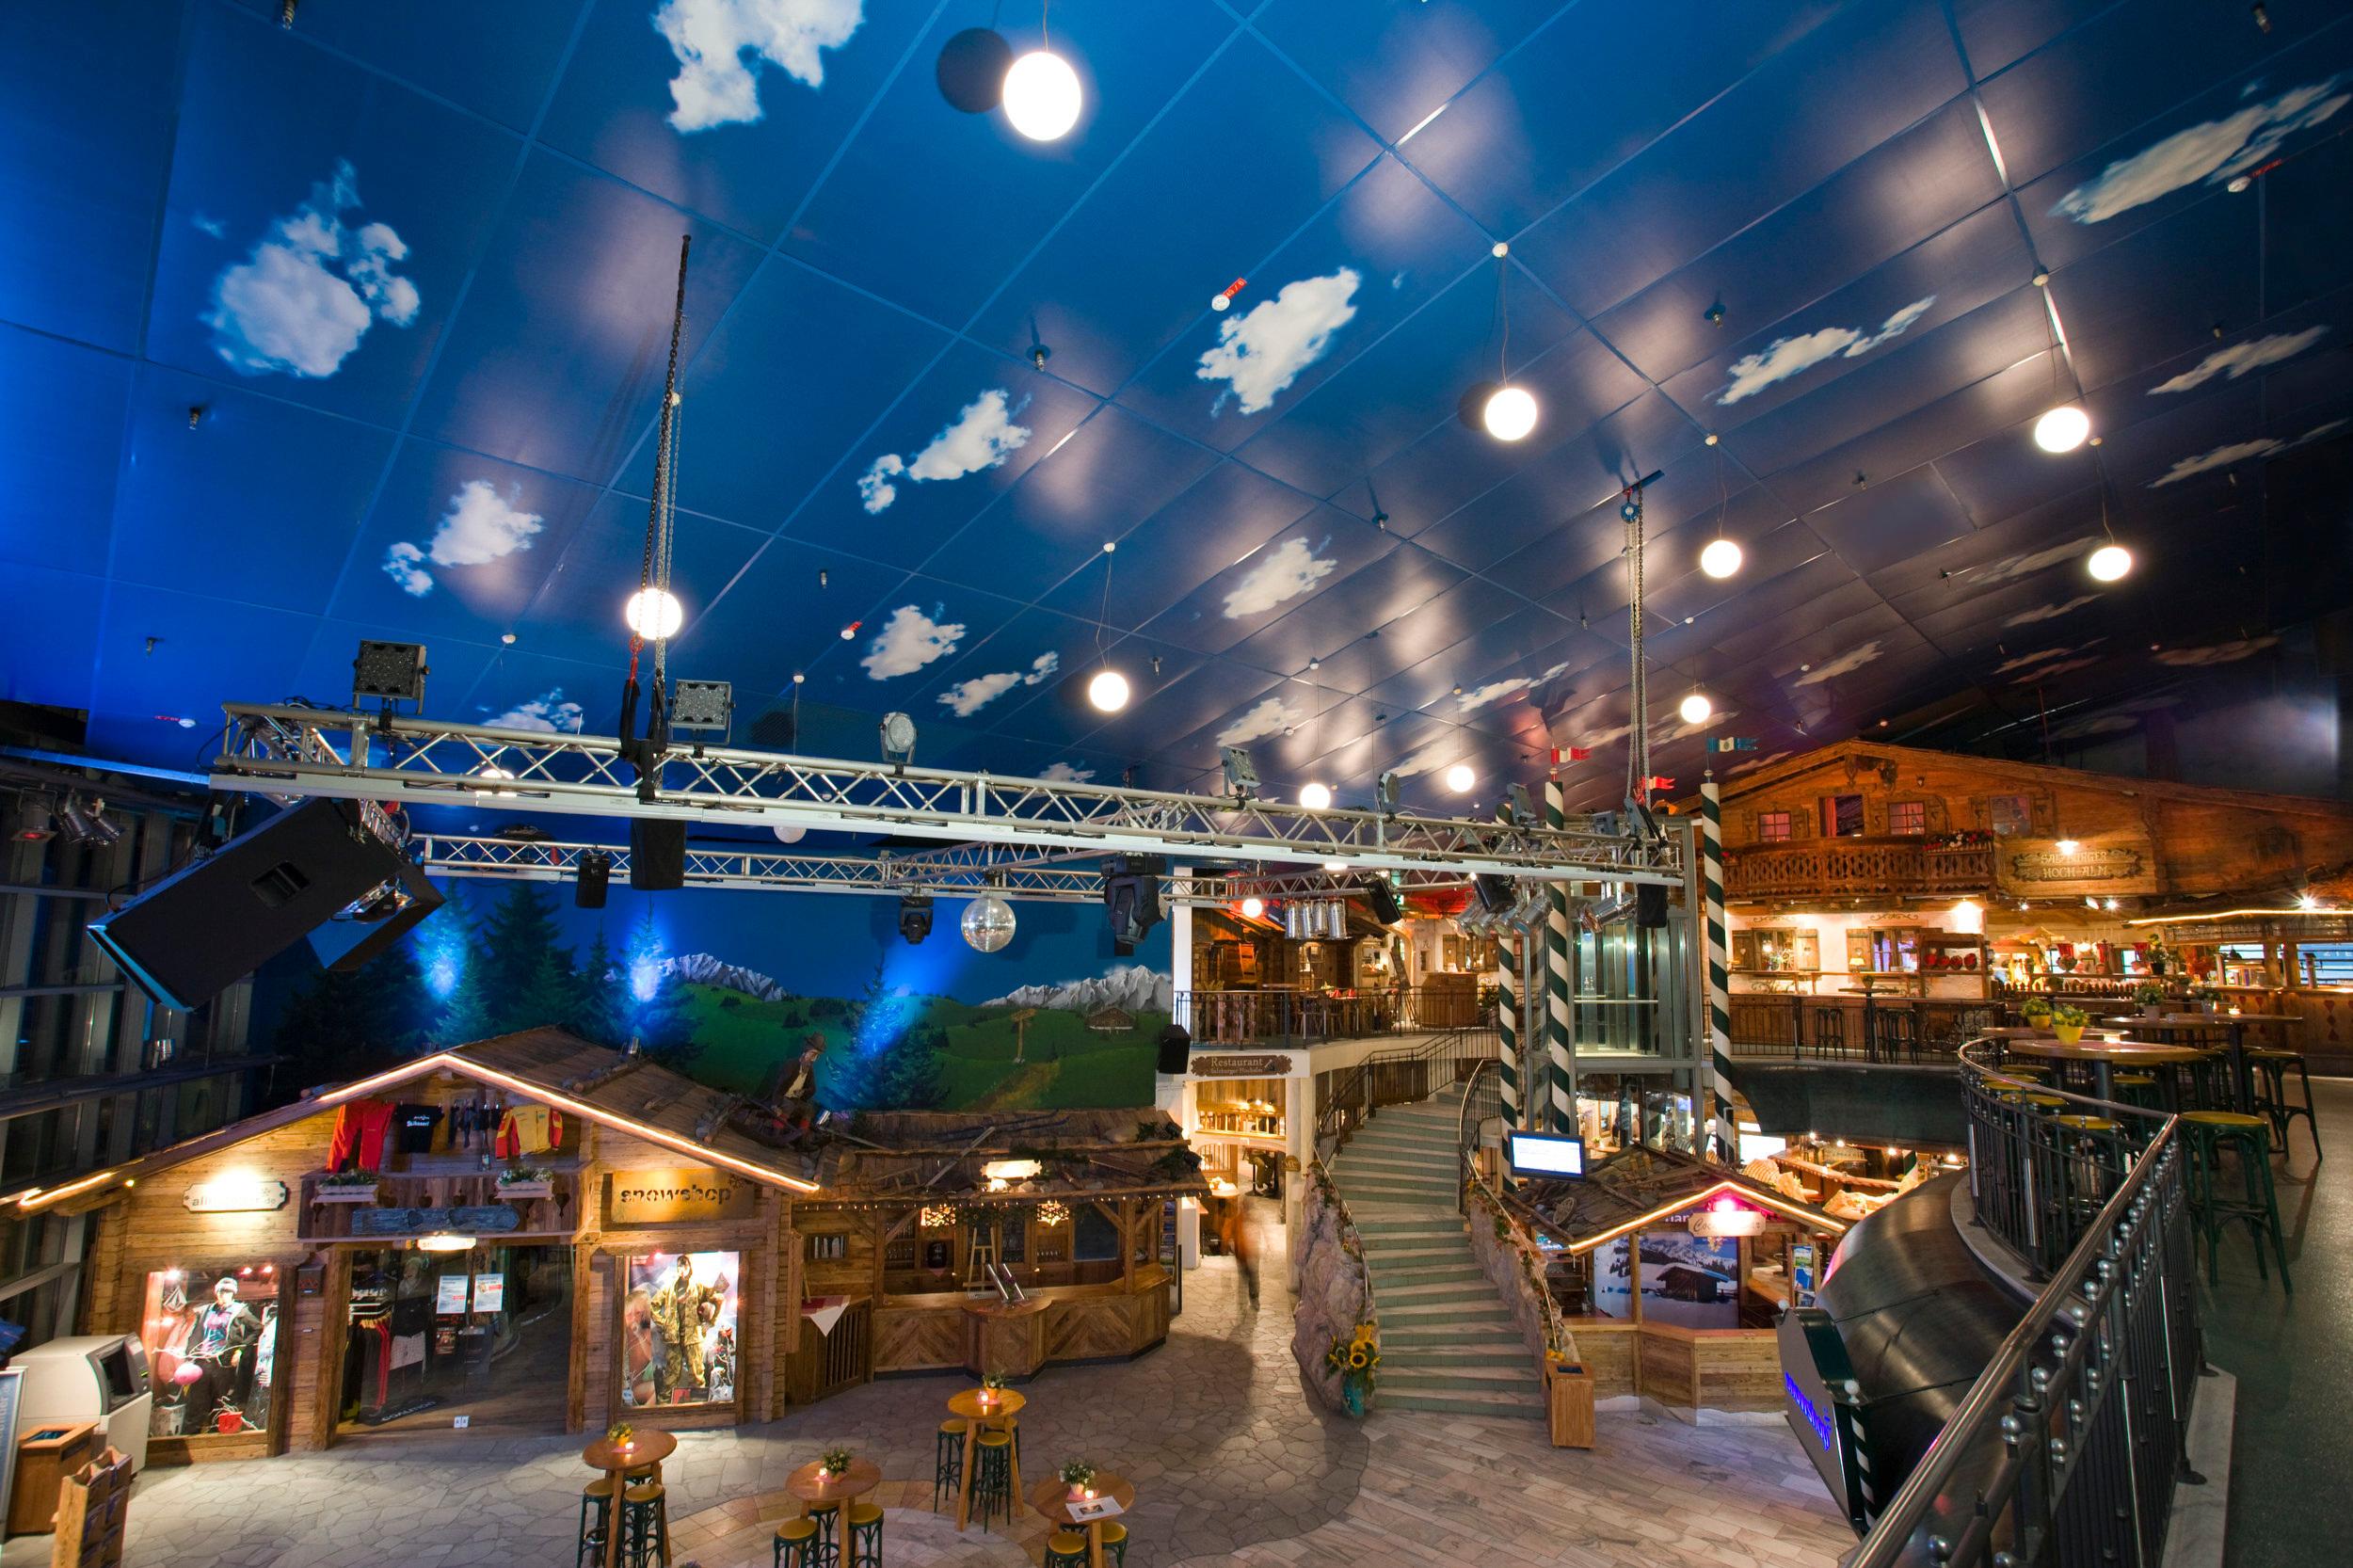 Skihalle, Neuss - Mediatex® Presto